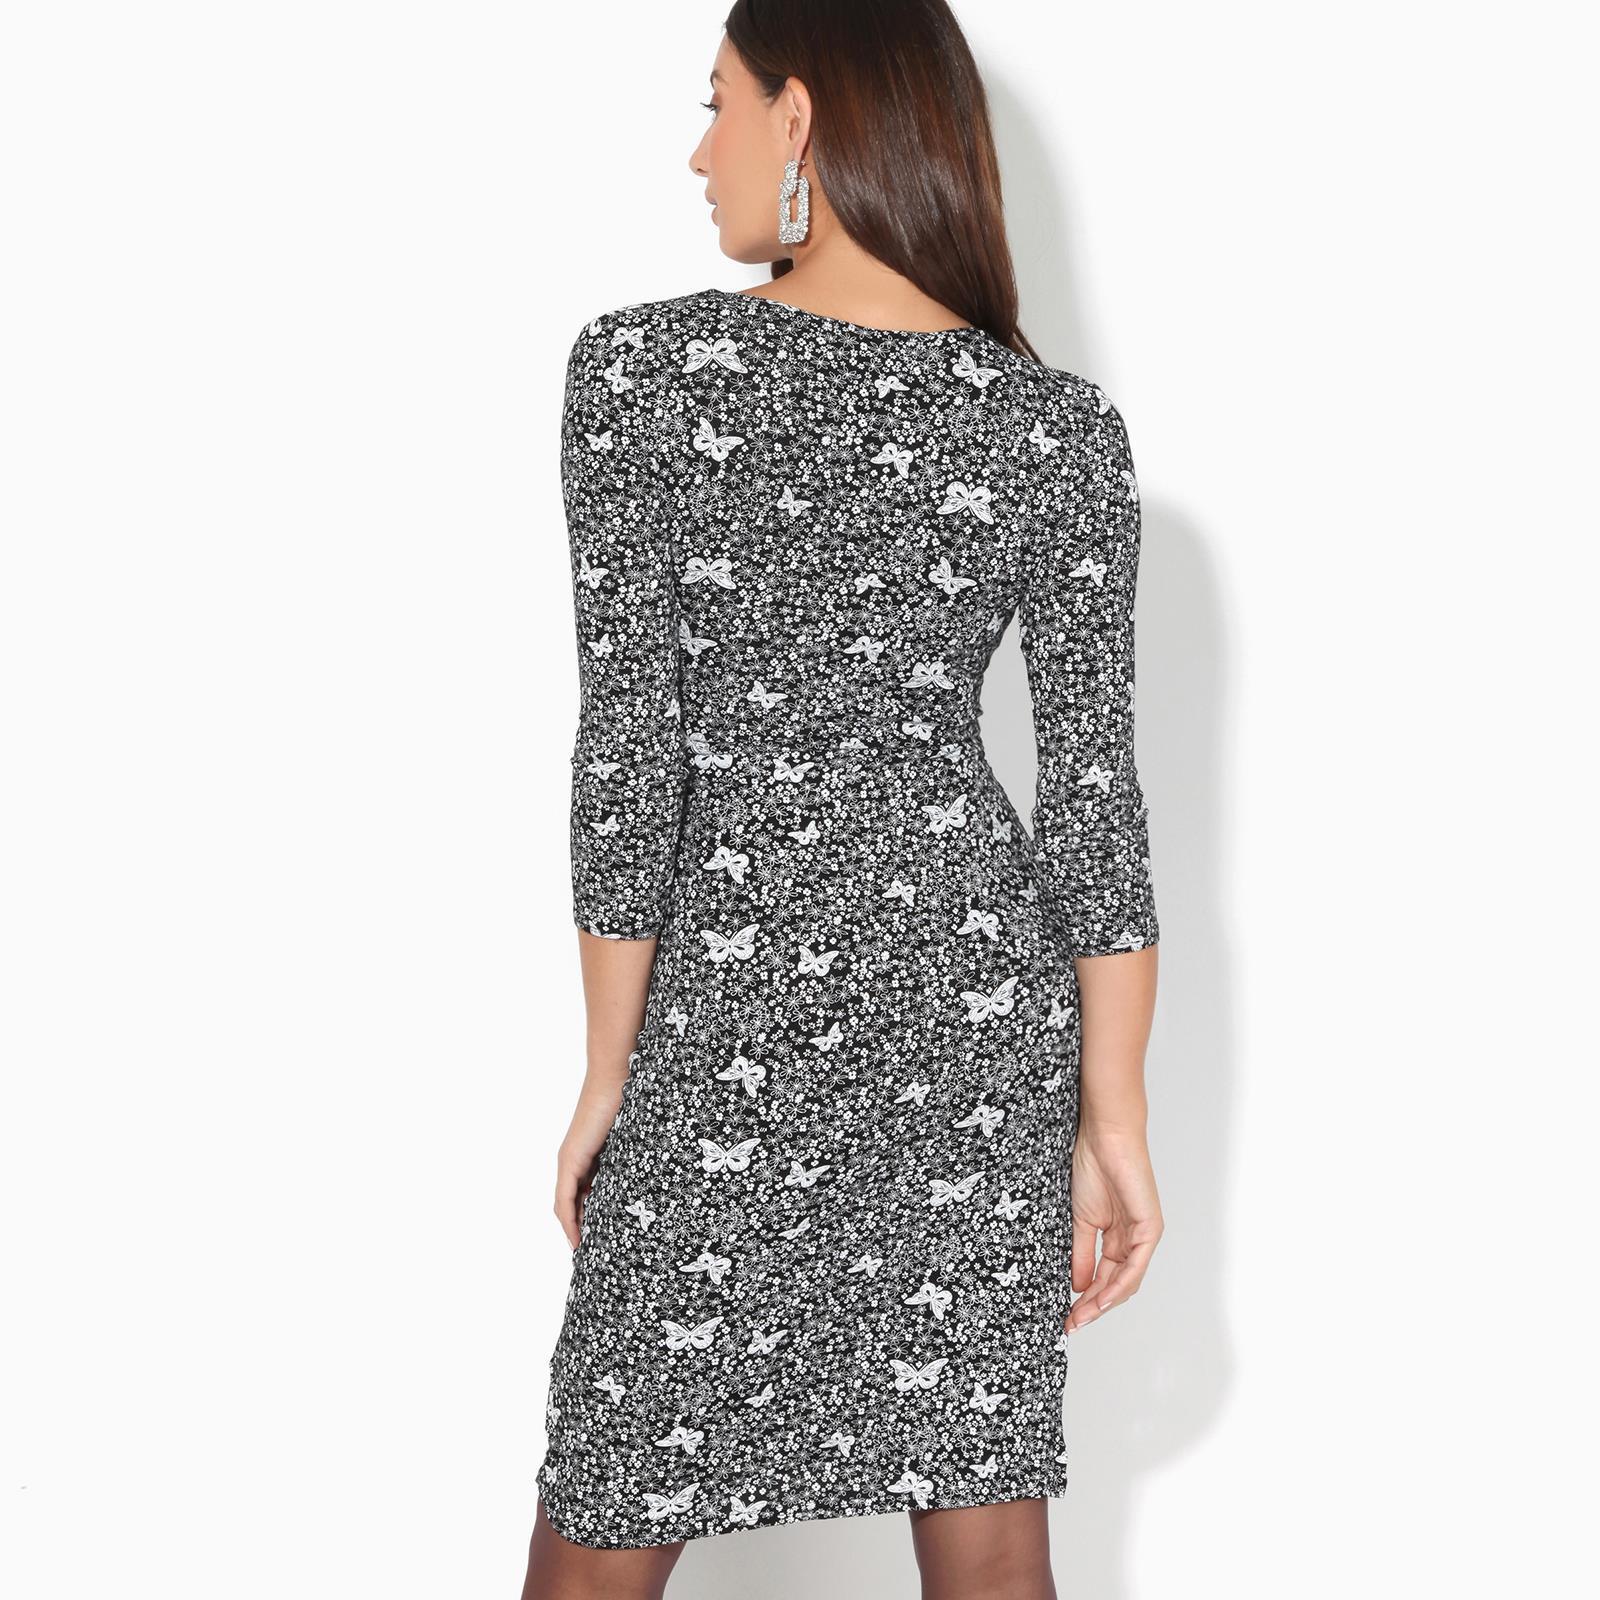 Damen Knielanges Wickelkleid Midi Kleid Vausschnitt Große